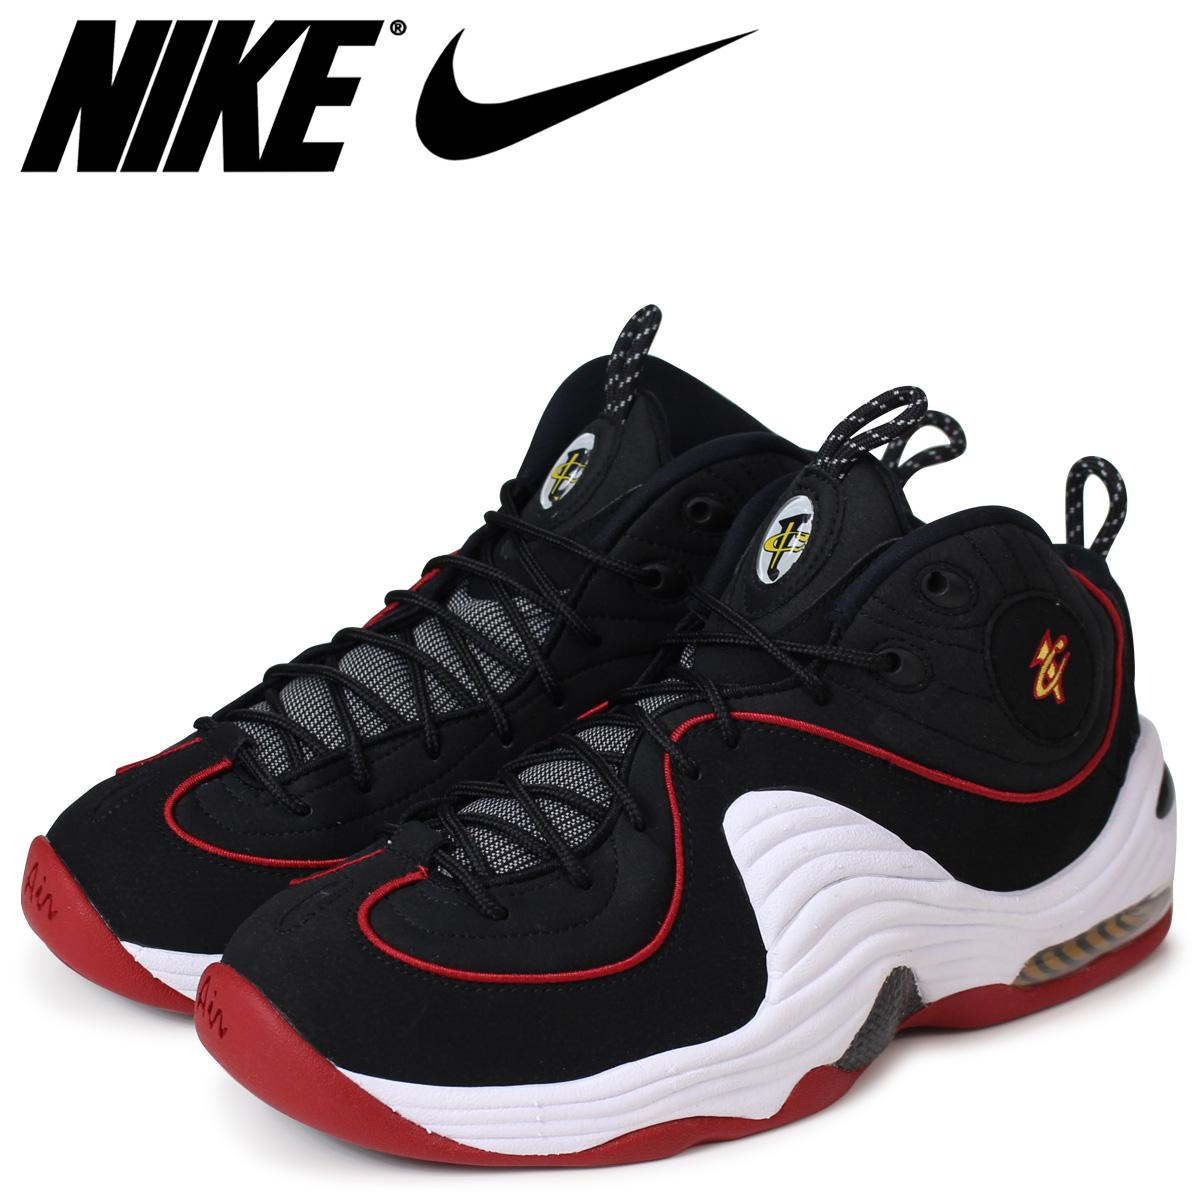 NIKE ナイキ エアペニー スニーカー AIR PENNY 2 マイアミヒート 333886-002 メンズ 靴 ブラック 【決算セール 返品不可】